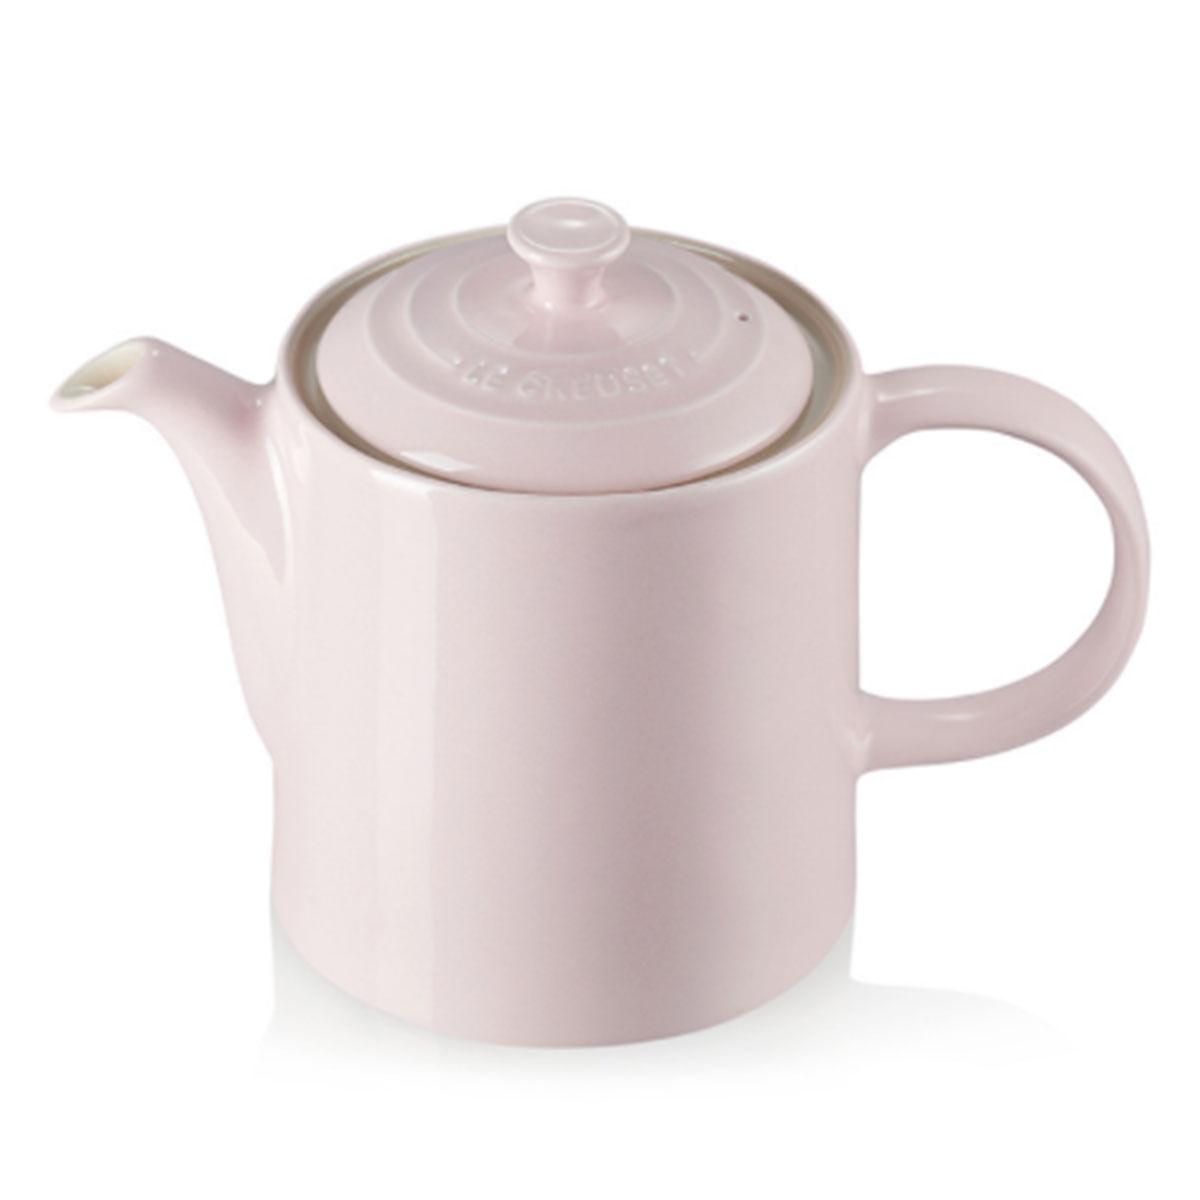 Bule Grand 1,3 Litros Rosa Chiffon Pink Le Creuset